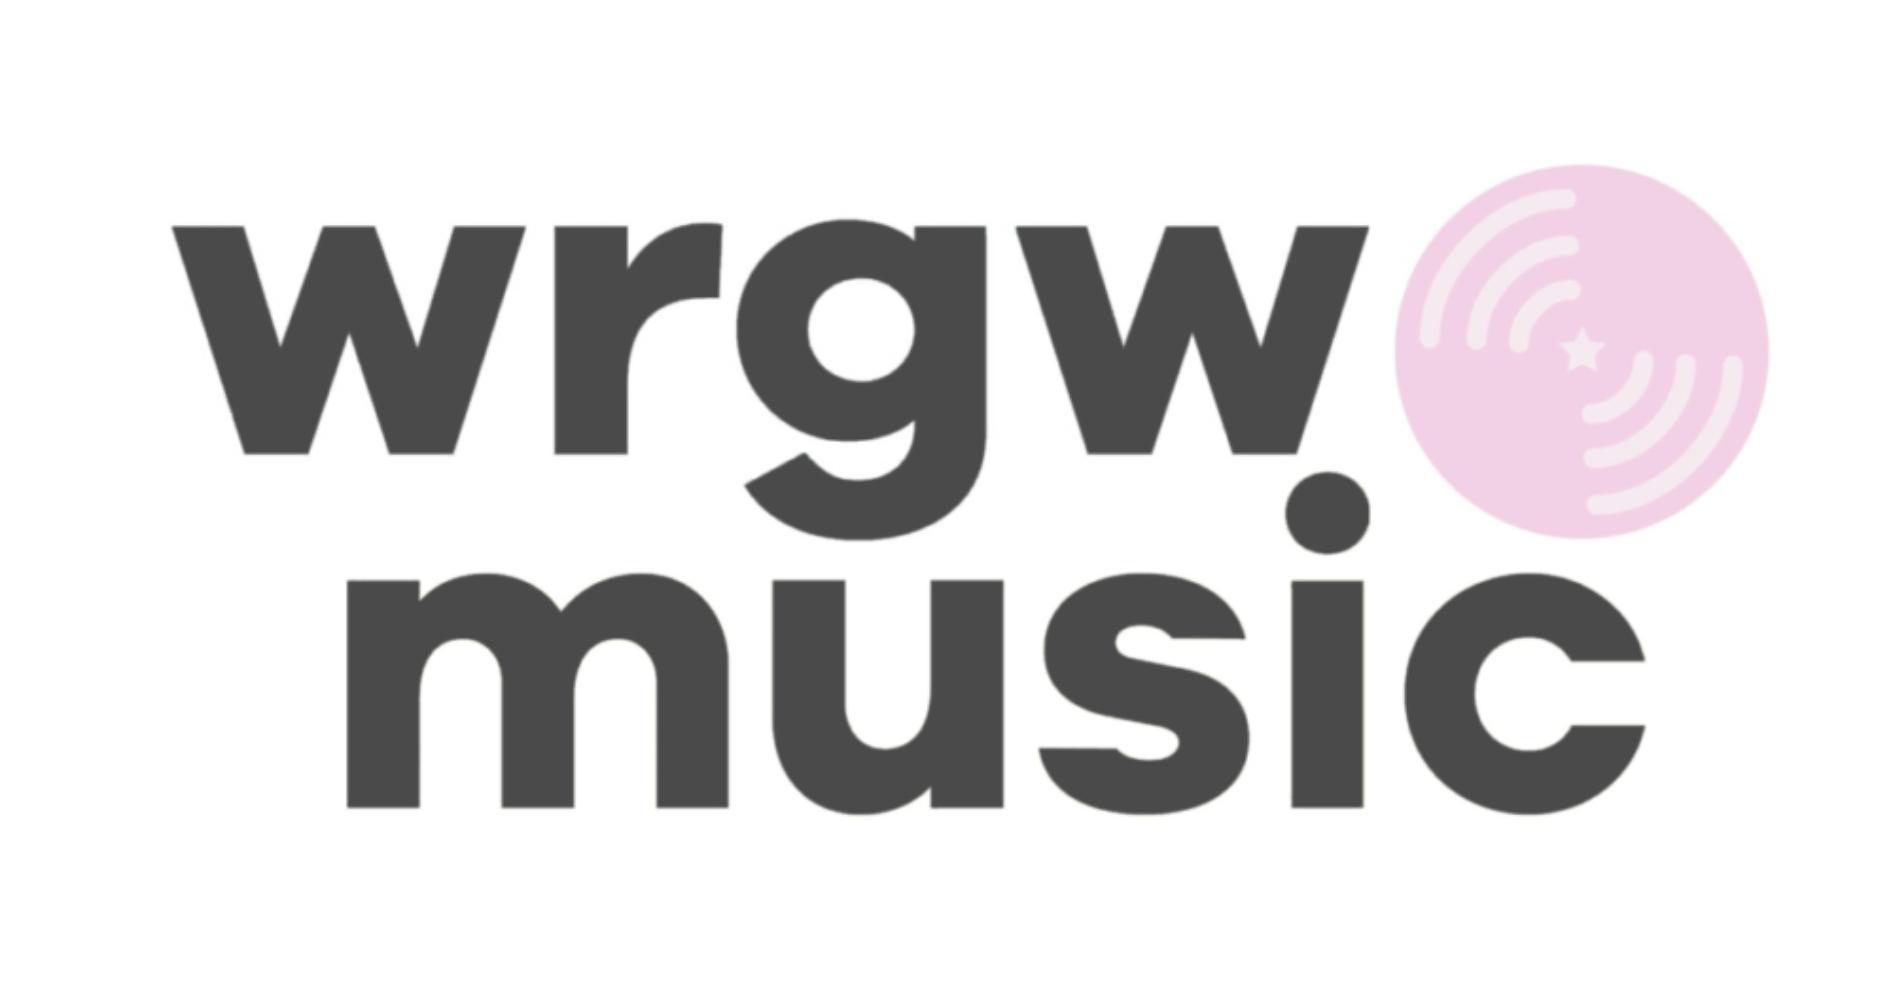 WRGW Music